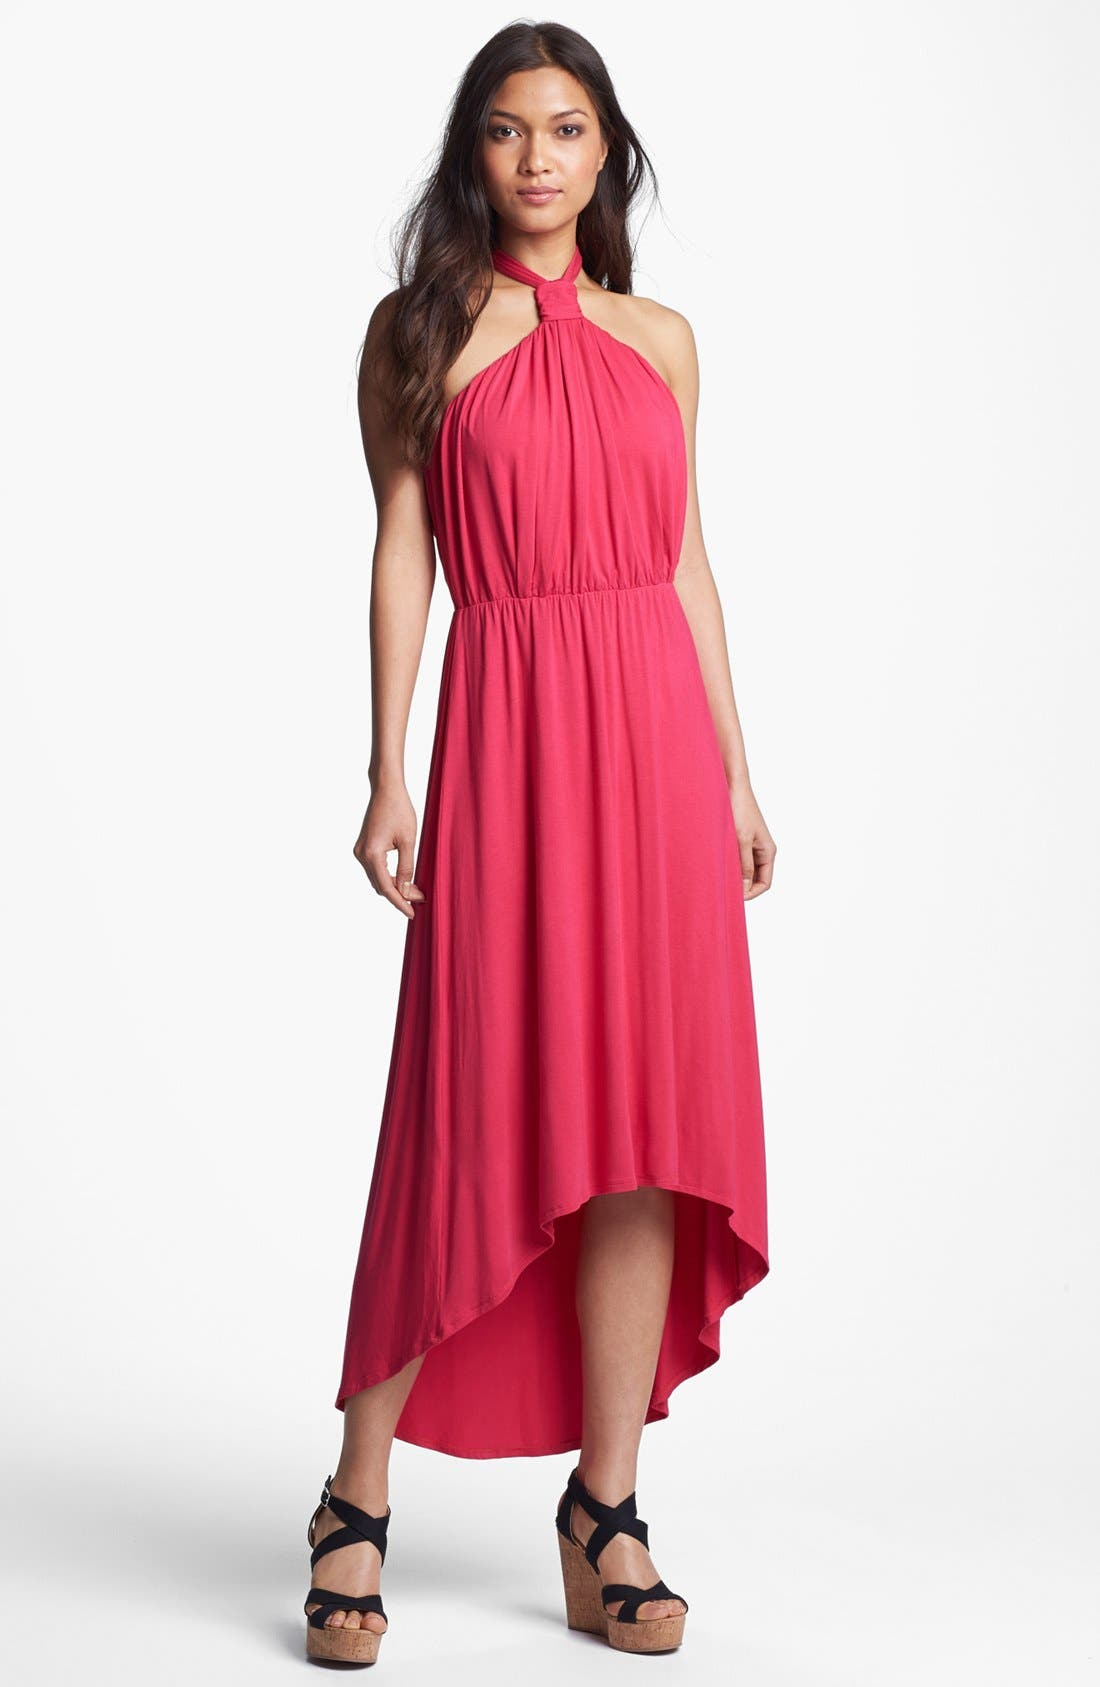 Alternate Image 1 Selected - Felicity & Coco Halter High/Low Maxi Dress (Regular & Petite) (Nordstrom Exclusive)